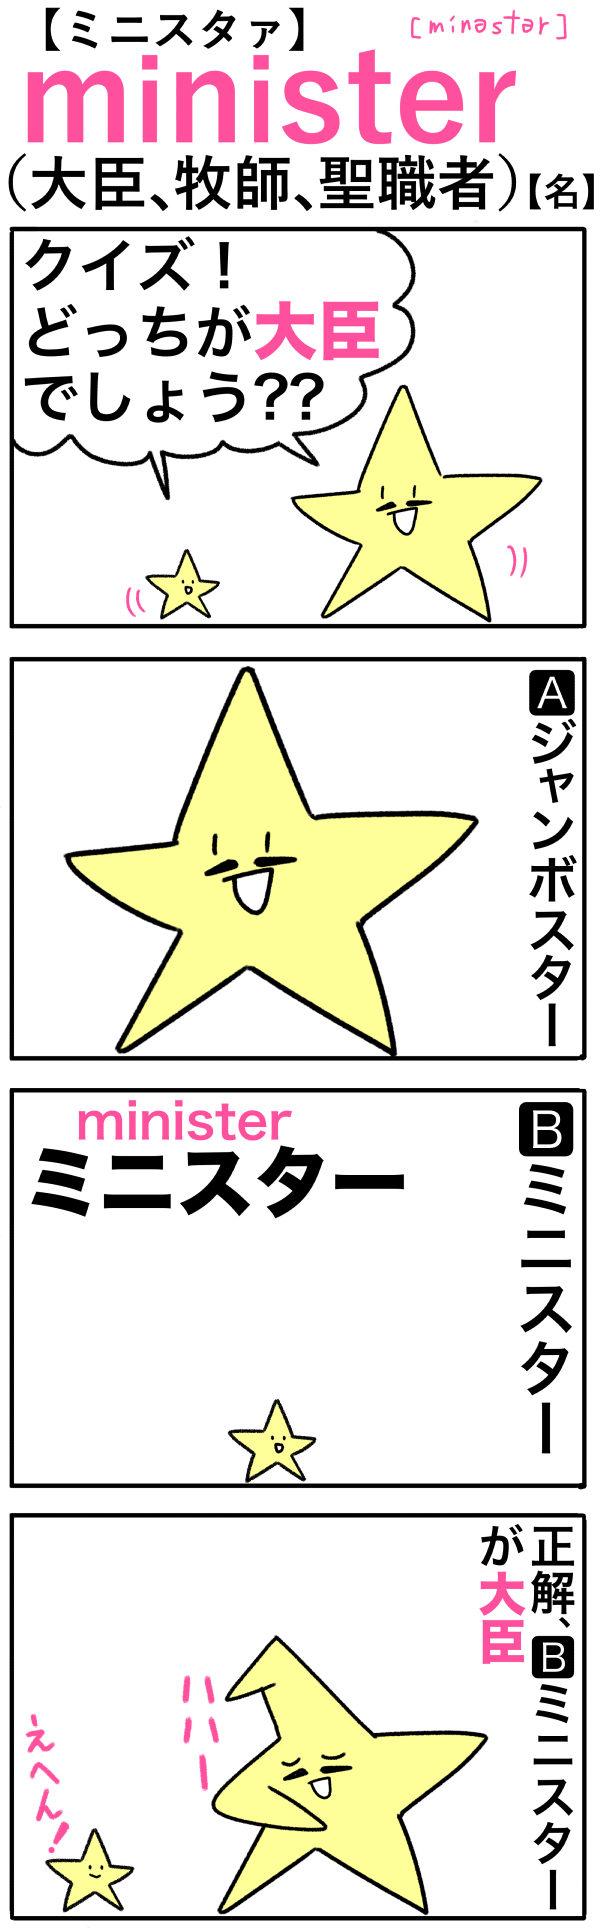 minister(大臣、牧師)の語呂合わせ英単語